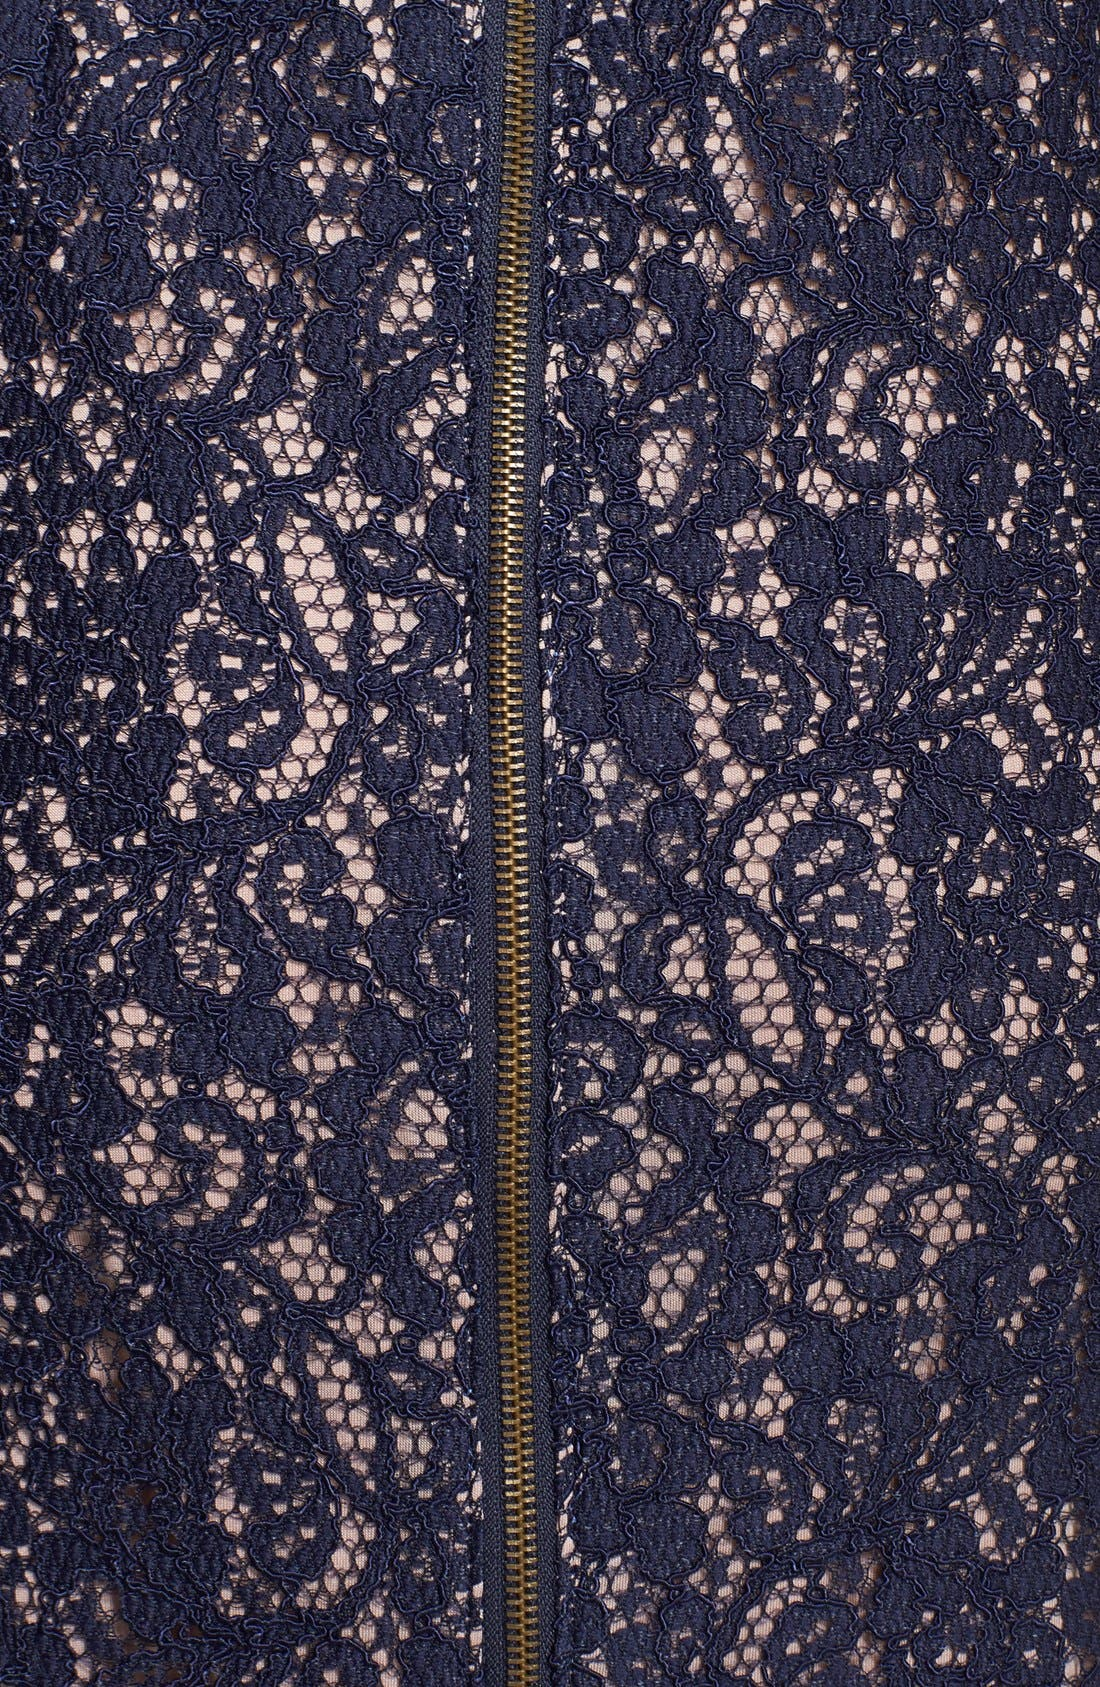 Boatneck Lace Sheath Dress,                             Alternate thumbnail 97, color,